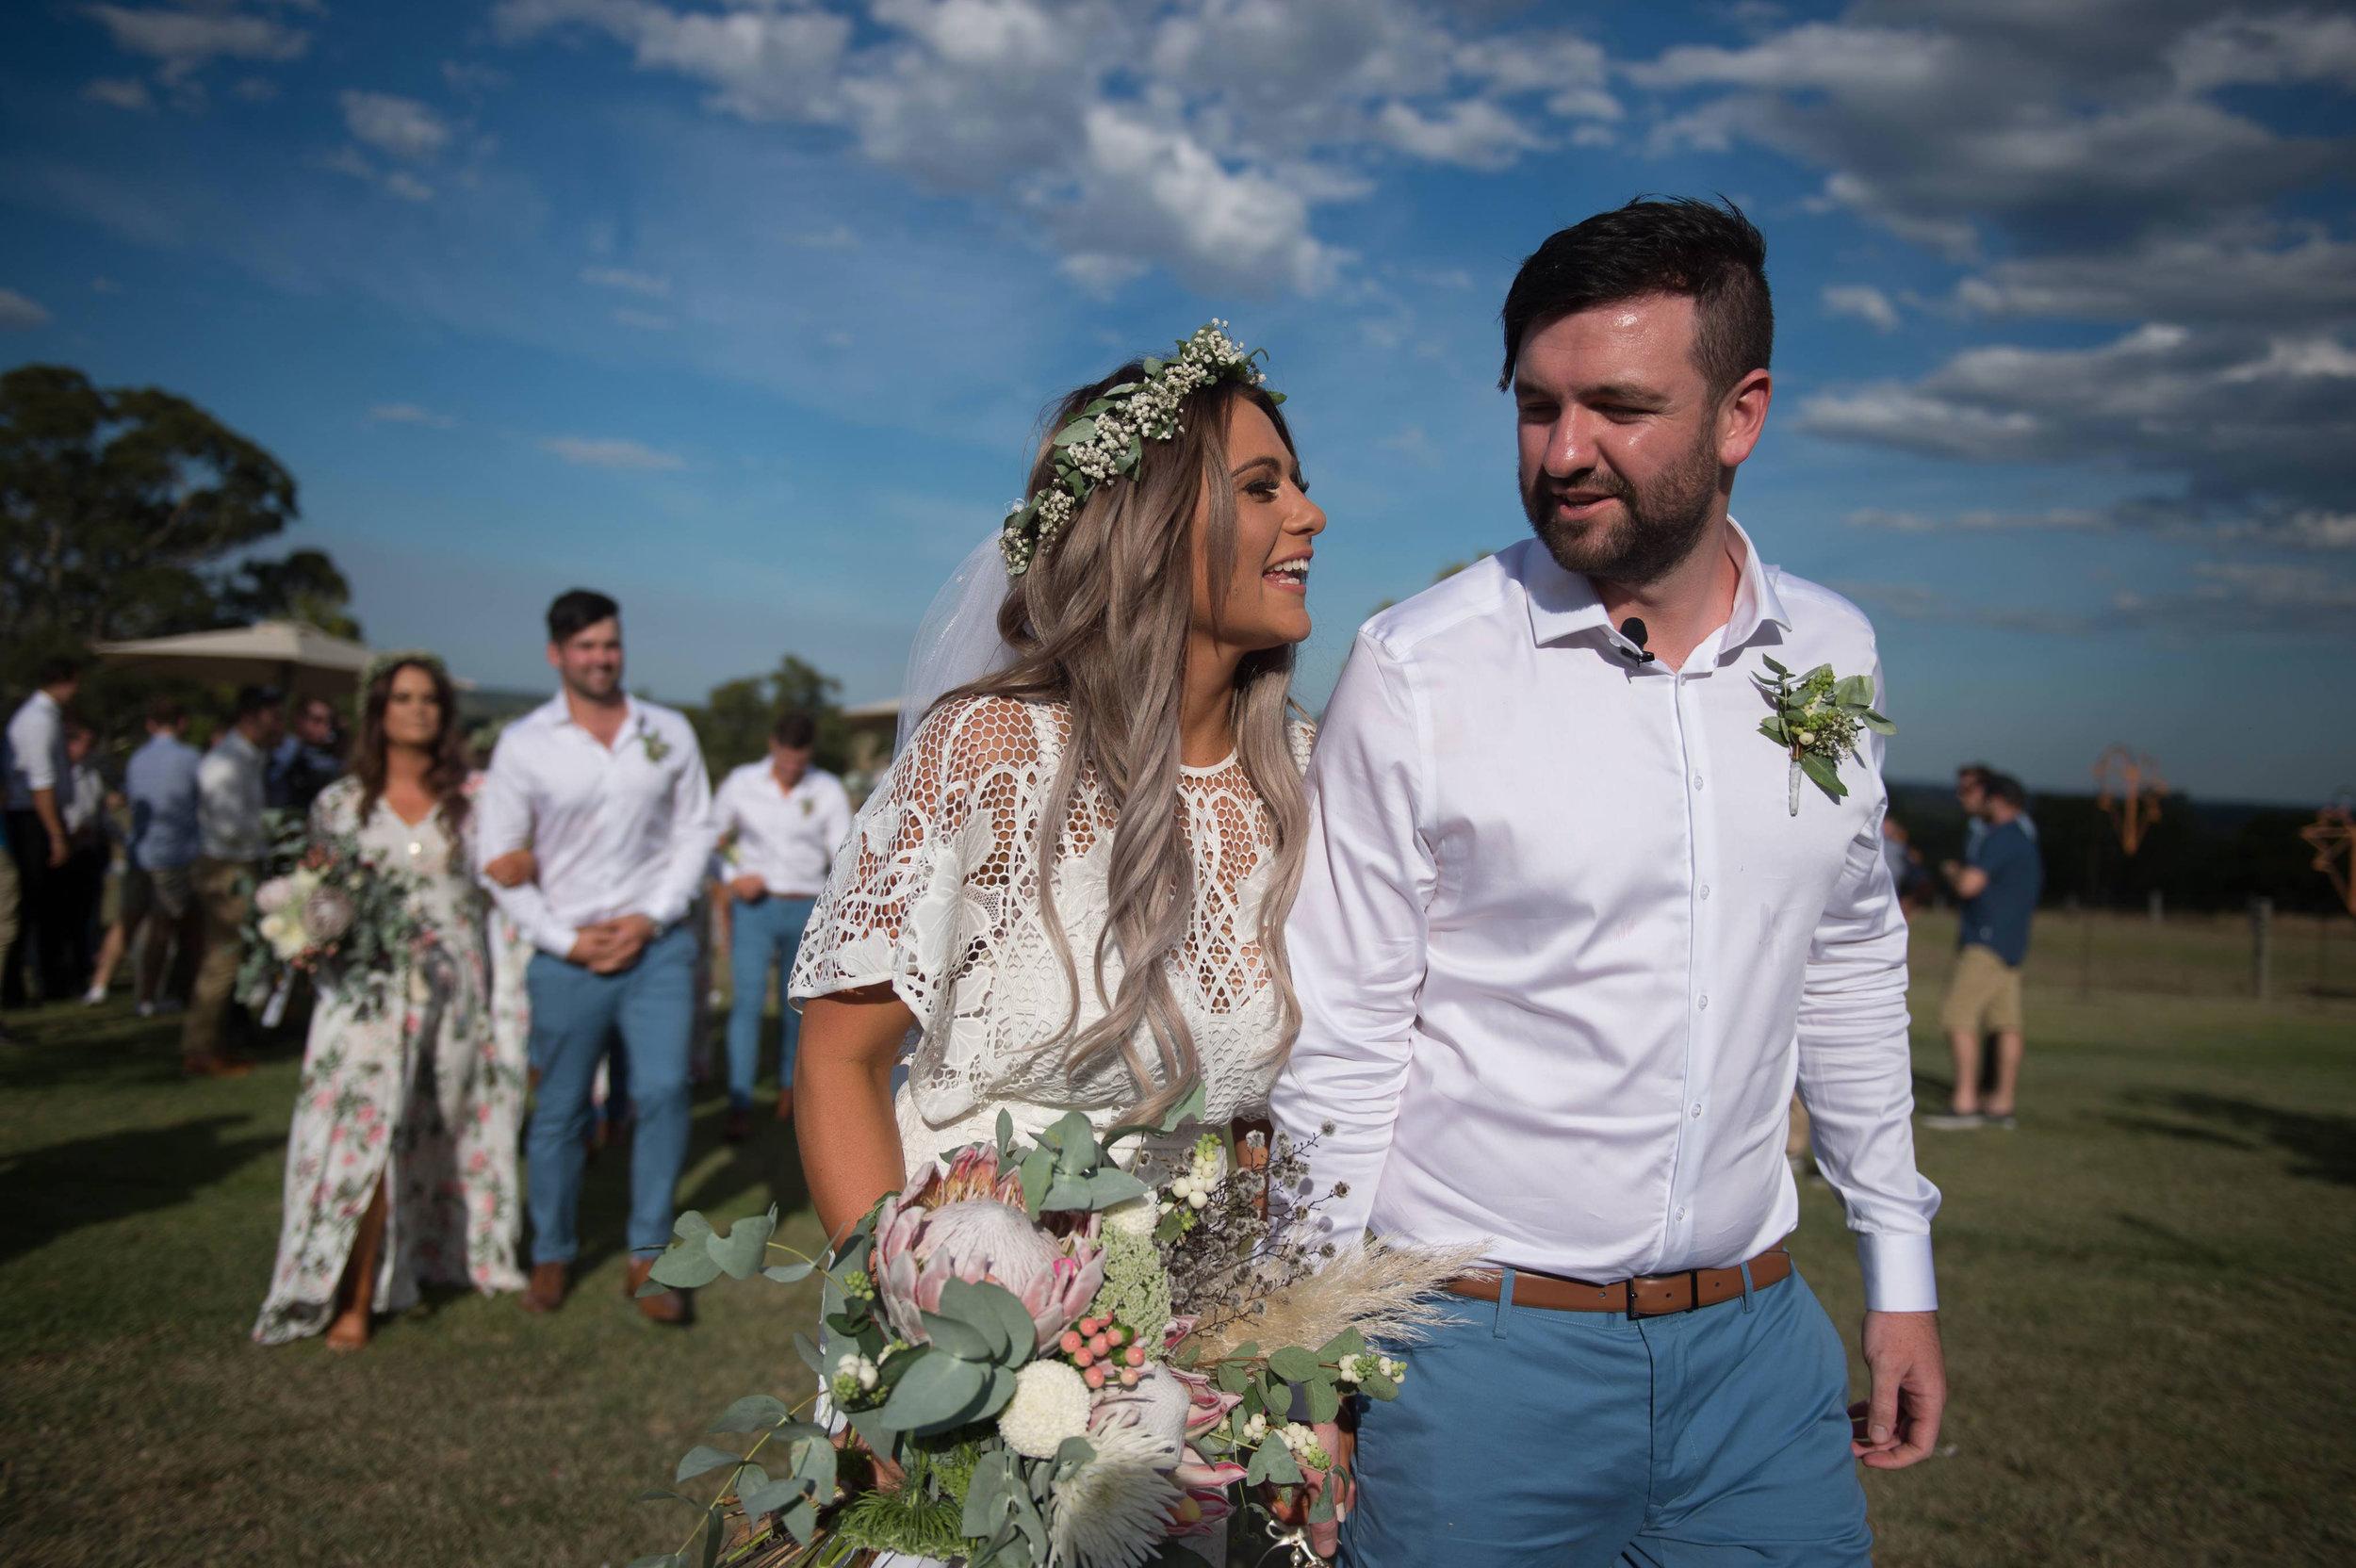 nics-wedding-2.jpg